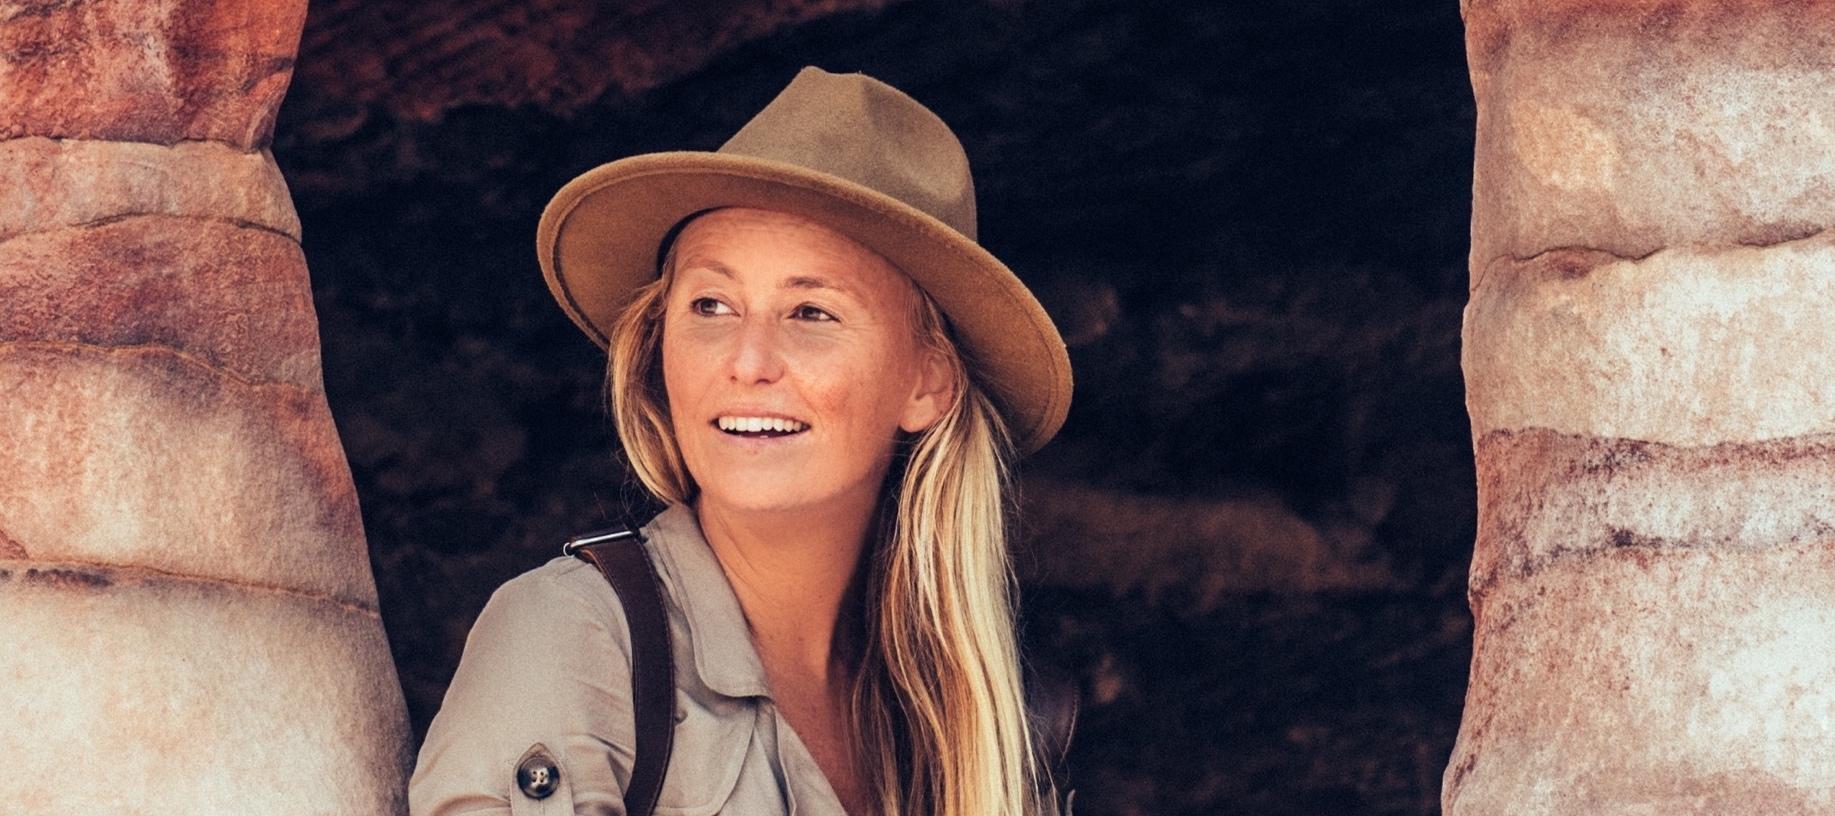 Alison Teal Indiana Jones narrow